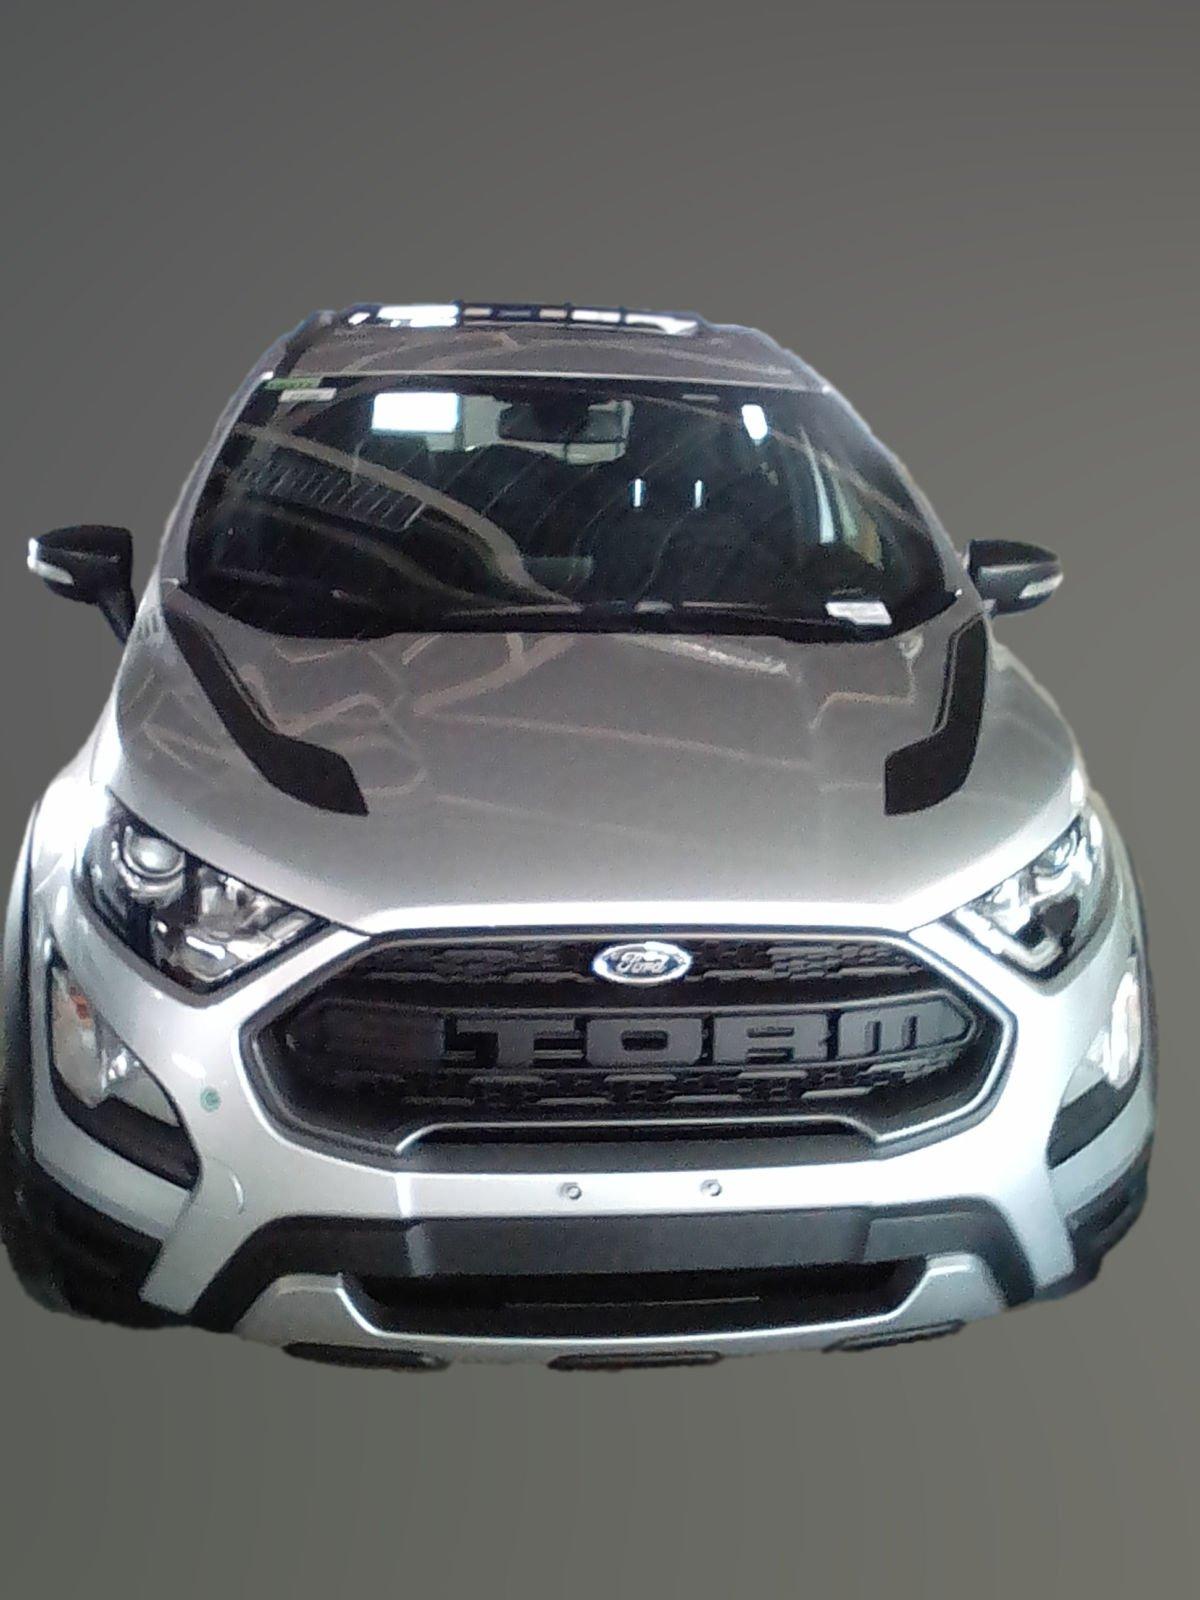 Ford Ecosport Storm Tera Preco Na Casa Dos R 100 Mil